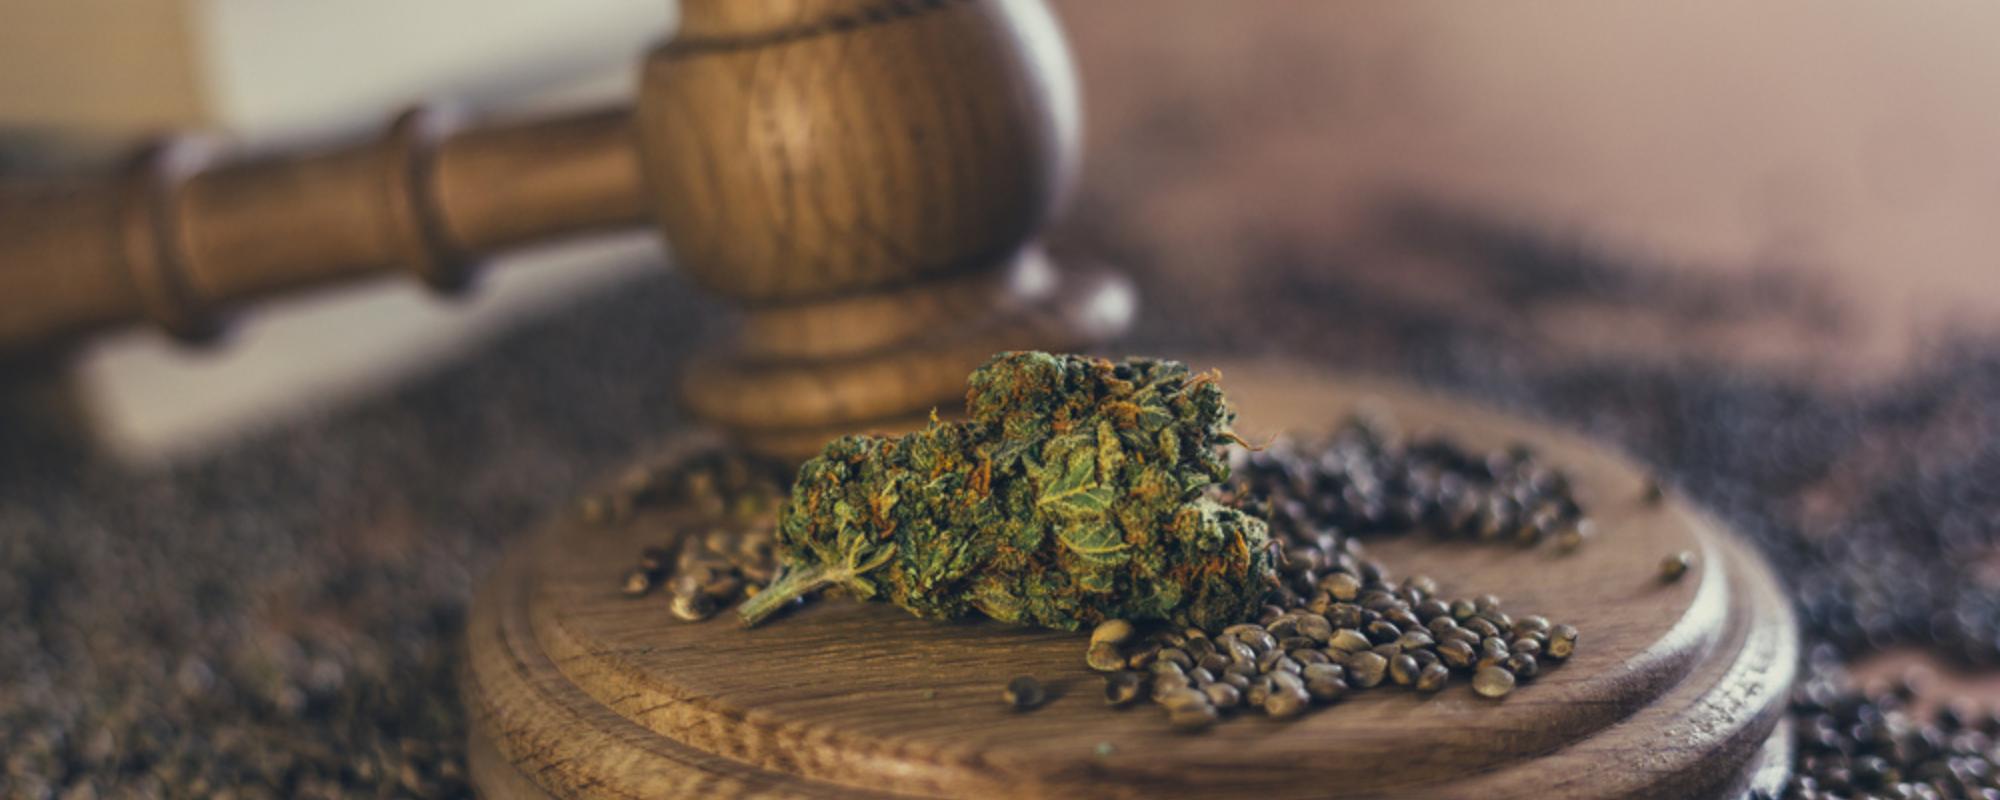 medical marijuana laws help